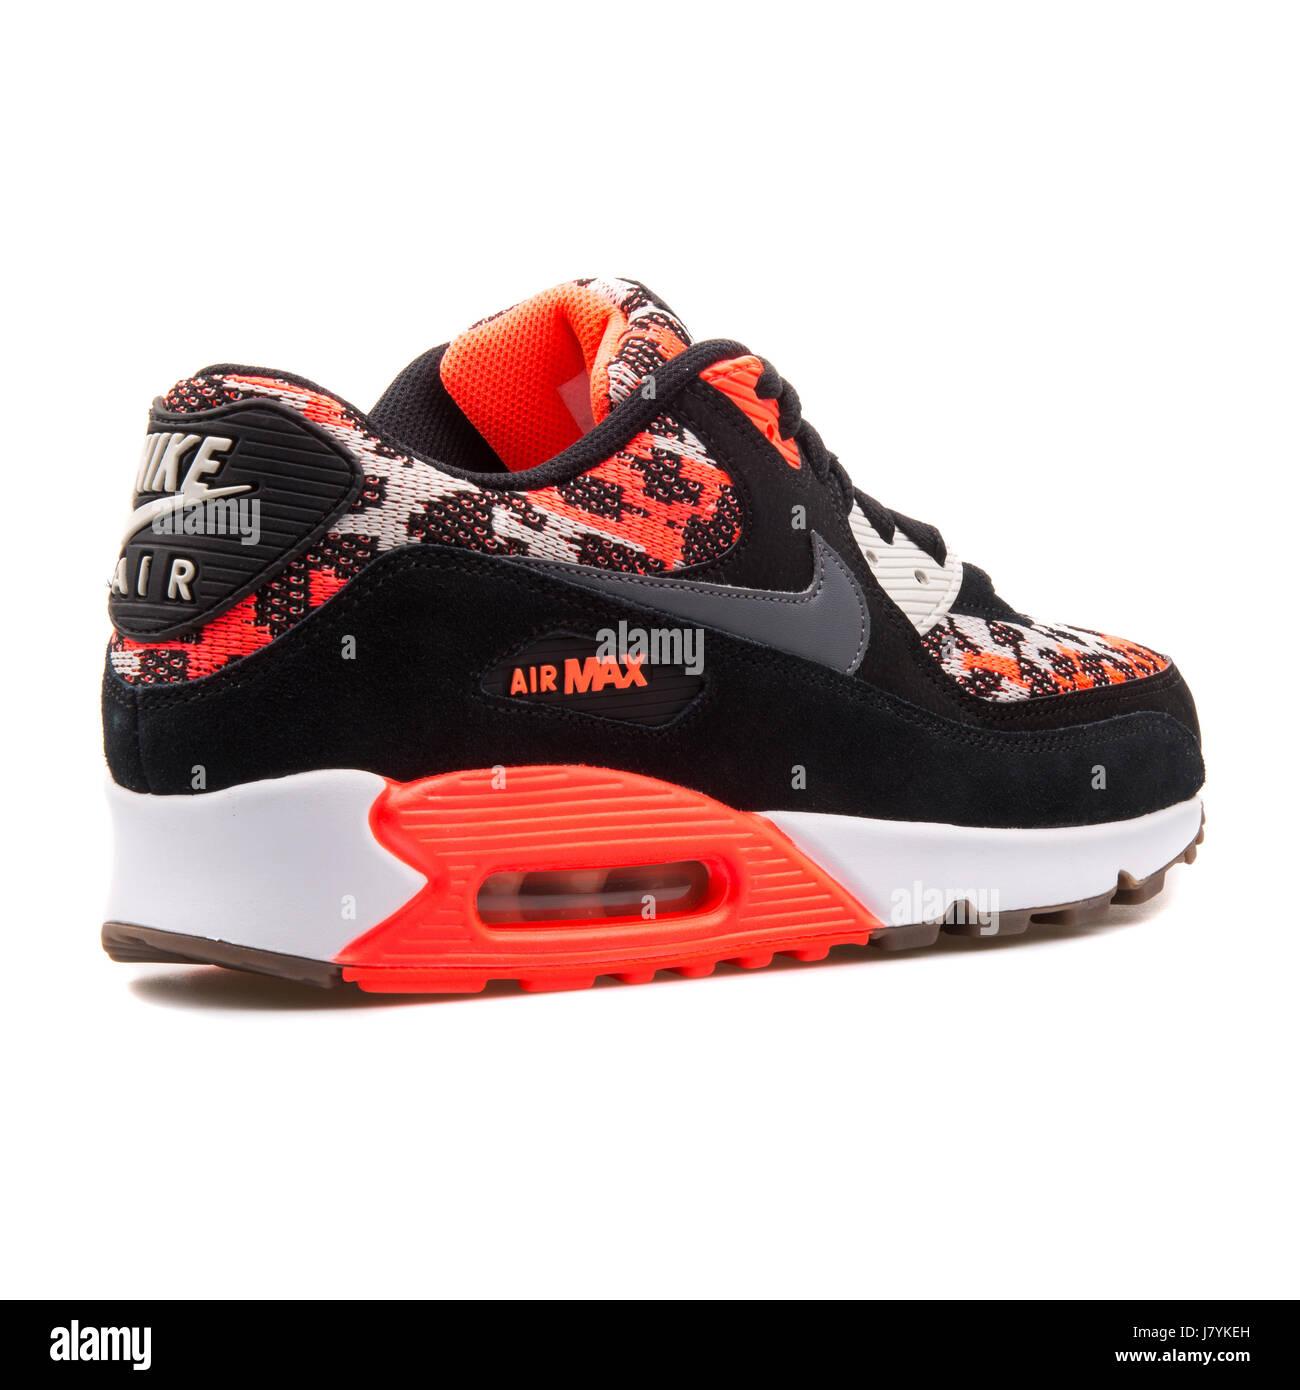 27e2cdf0 Nike Air Max 90 PA Hot Lava Pattern Black Sneakers - 749674-800 ...